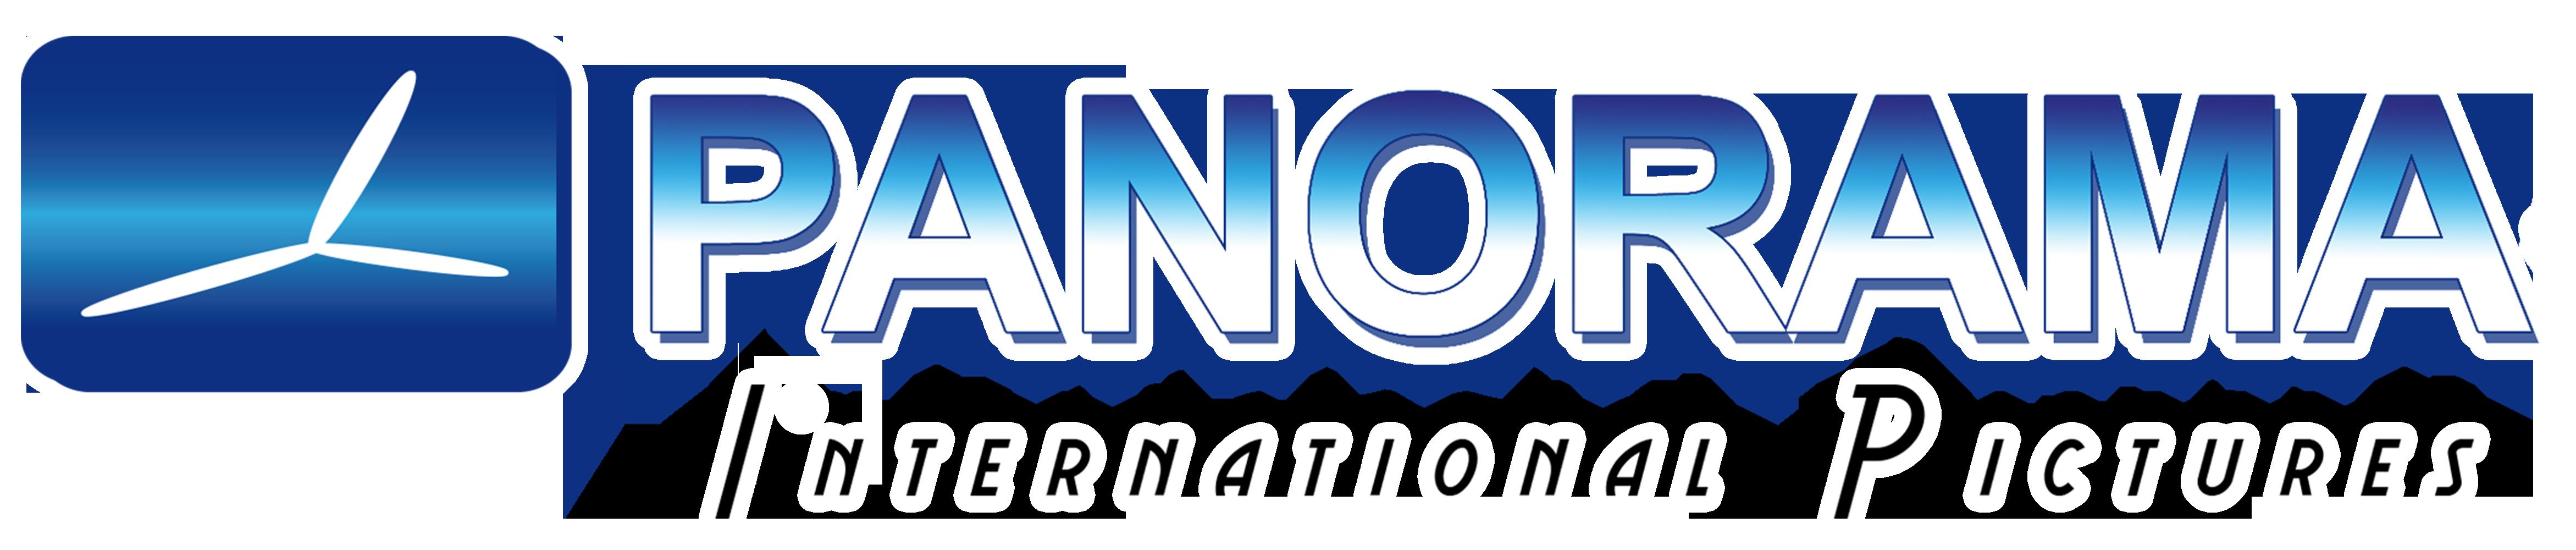 Panorama-IP